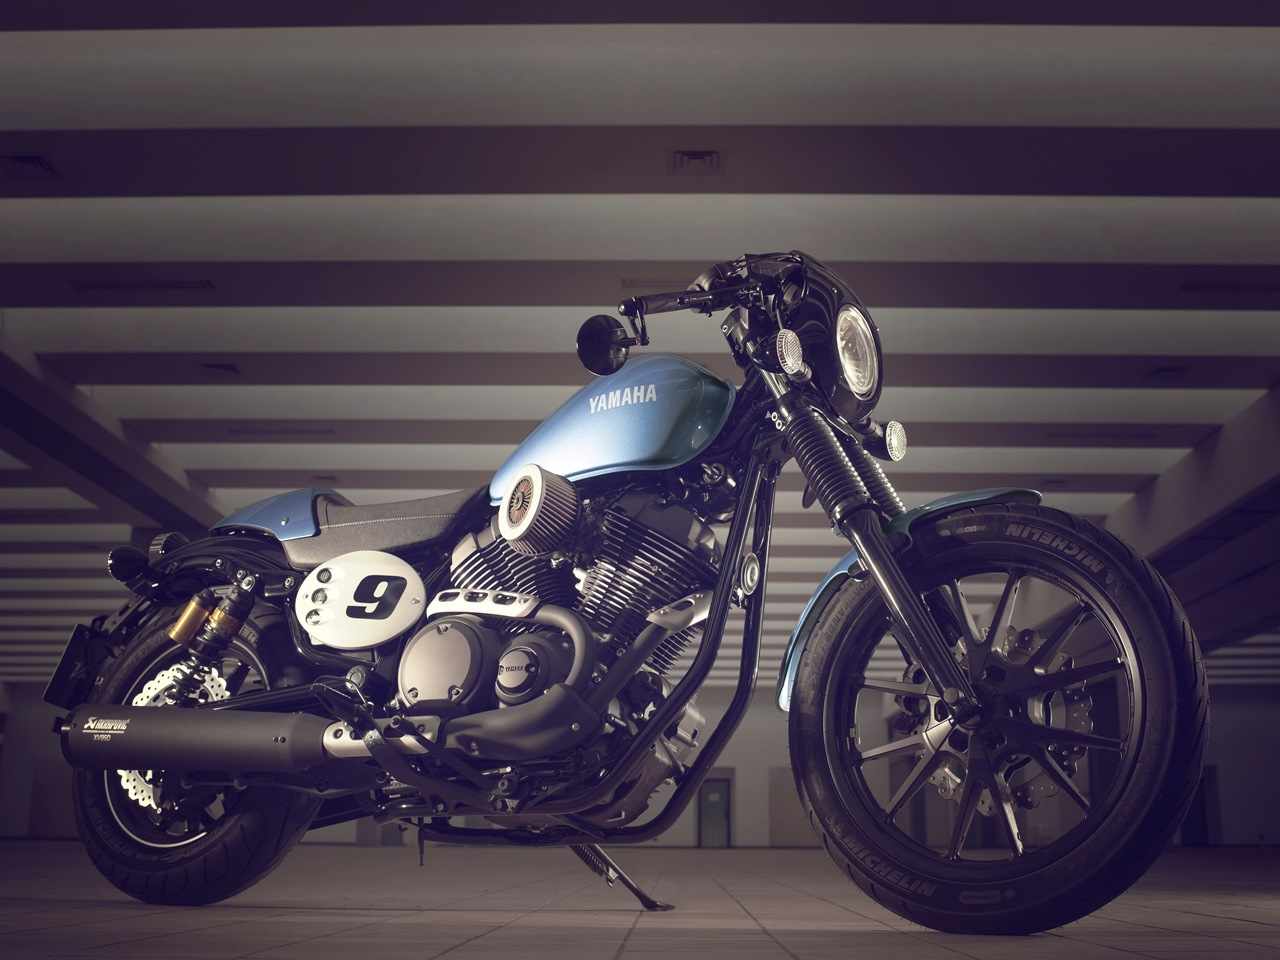 2015 Yamaha XV950 Racer blue